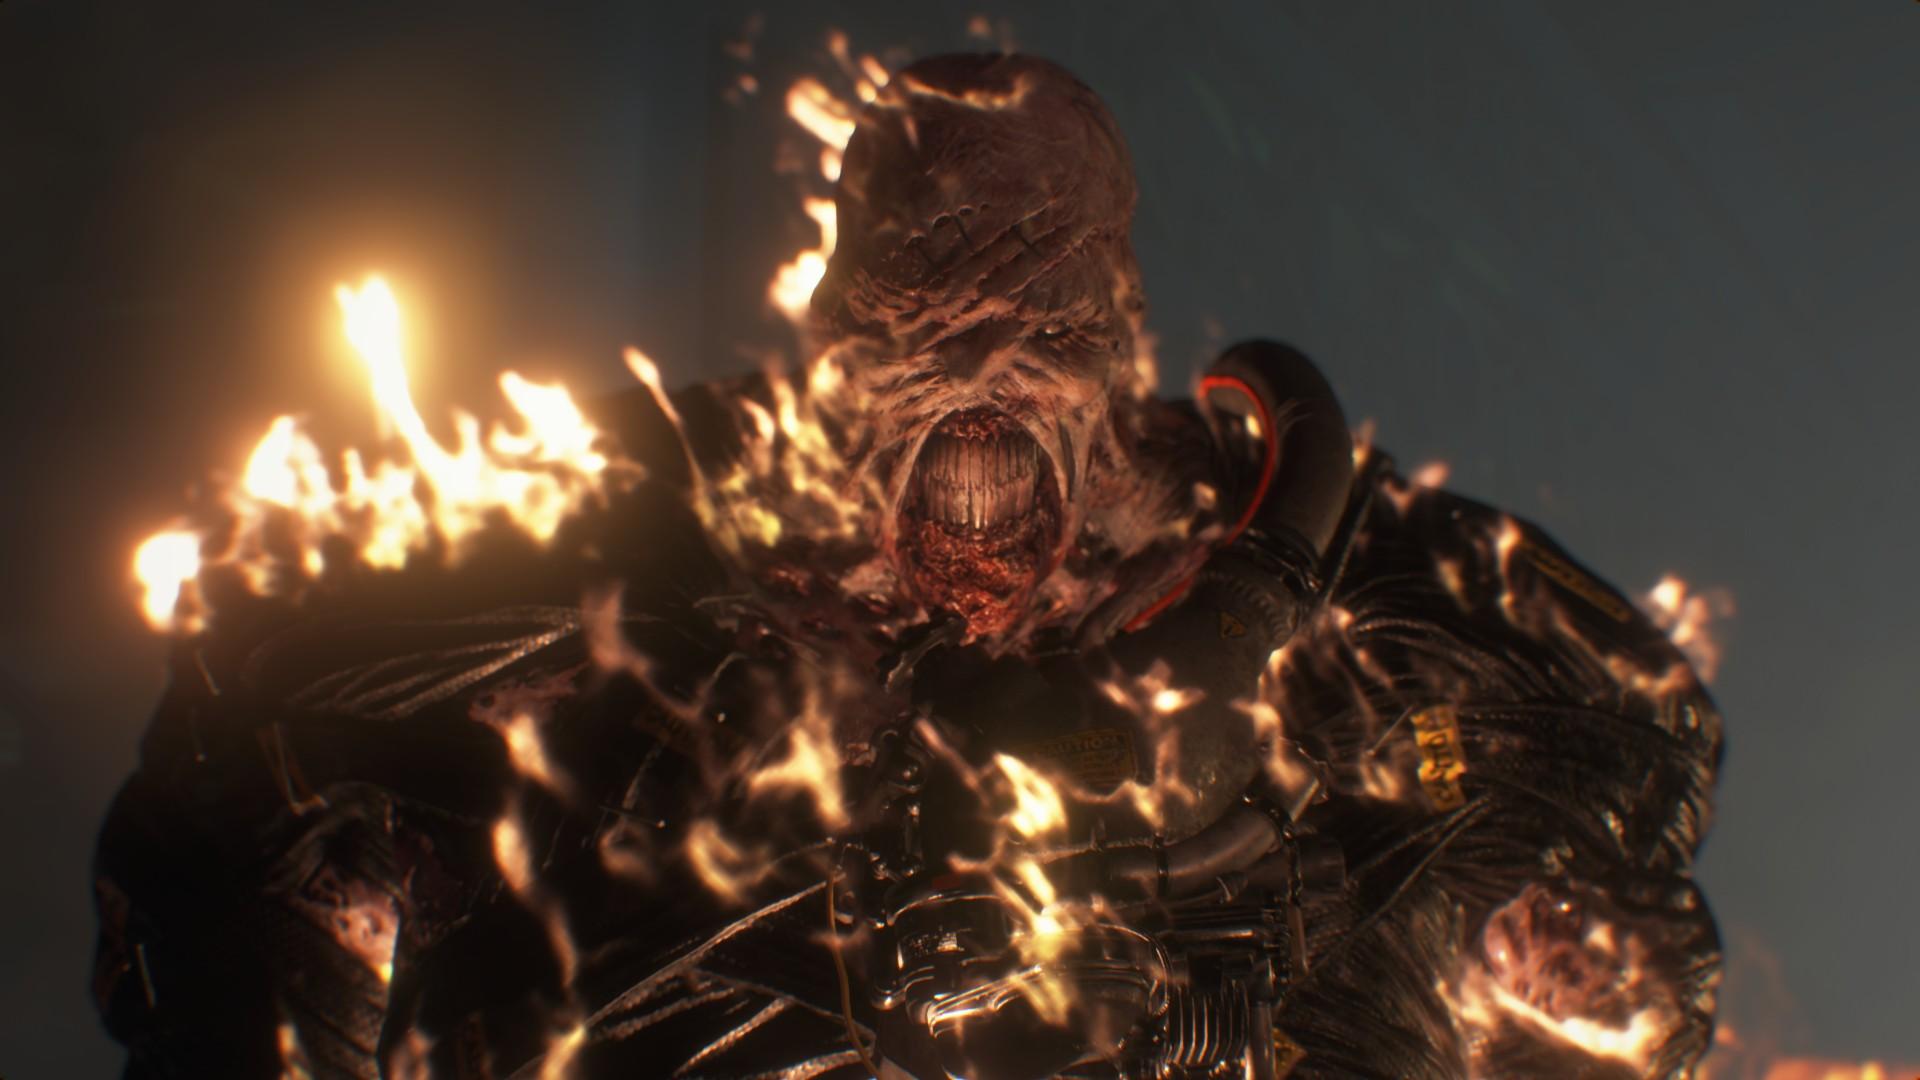 nicholai ginovaef resident evil apocalypse